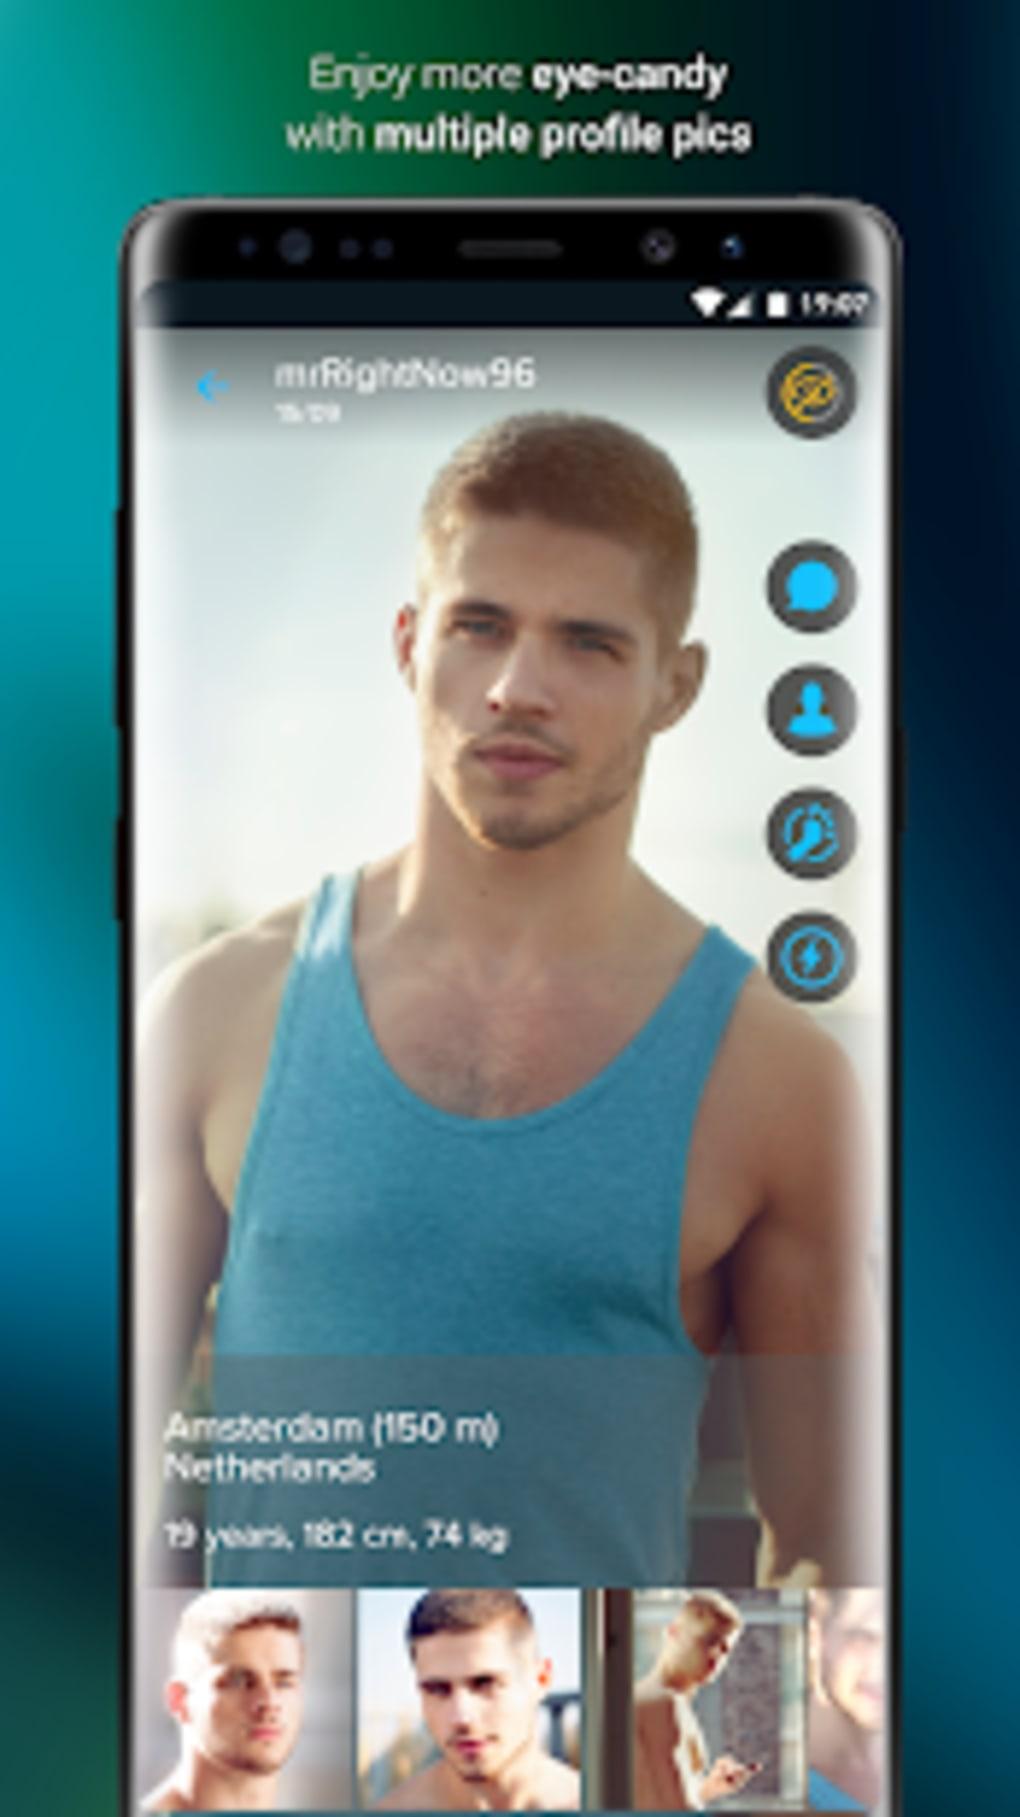 download romeo gay chat